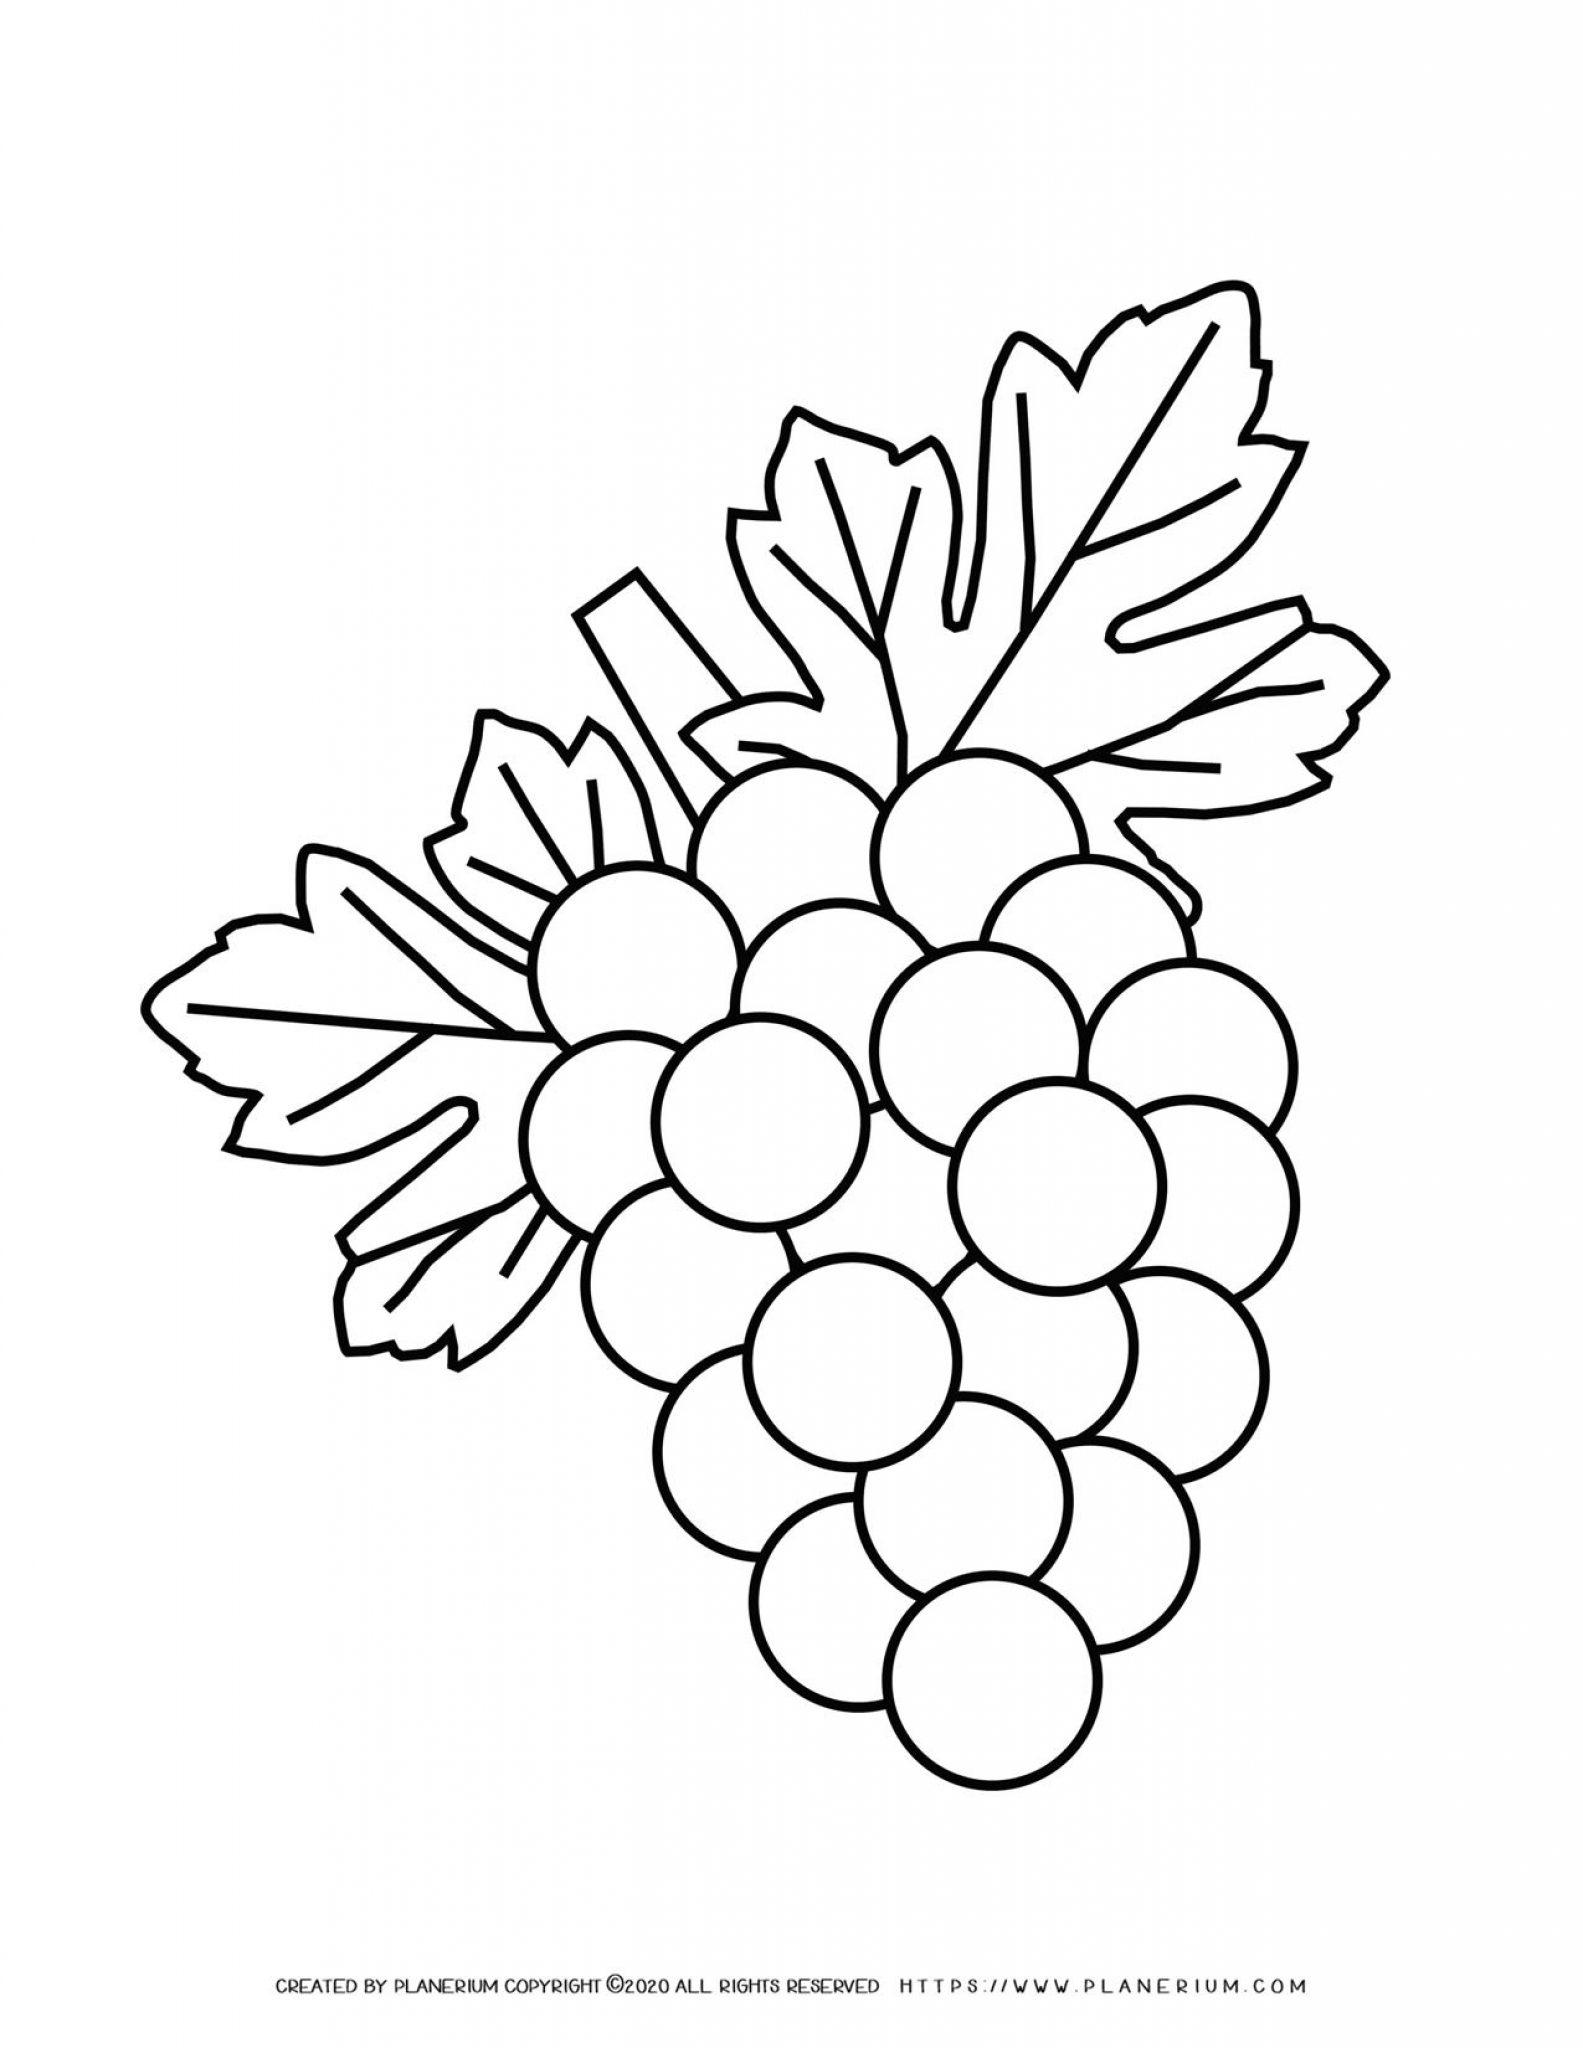 Grapes - Coloring page | Planerium